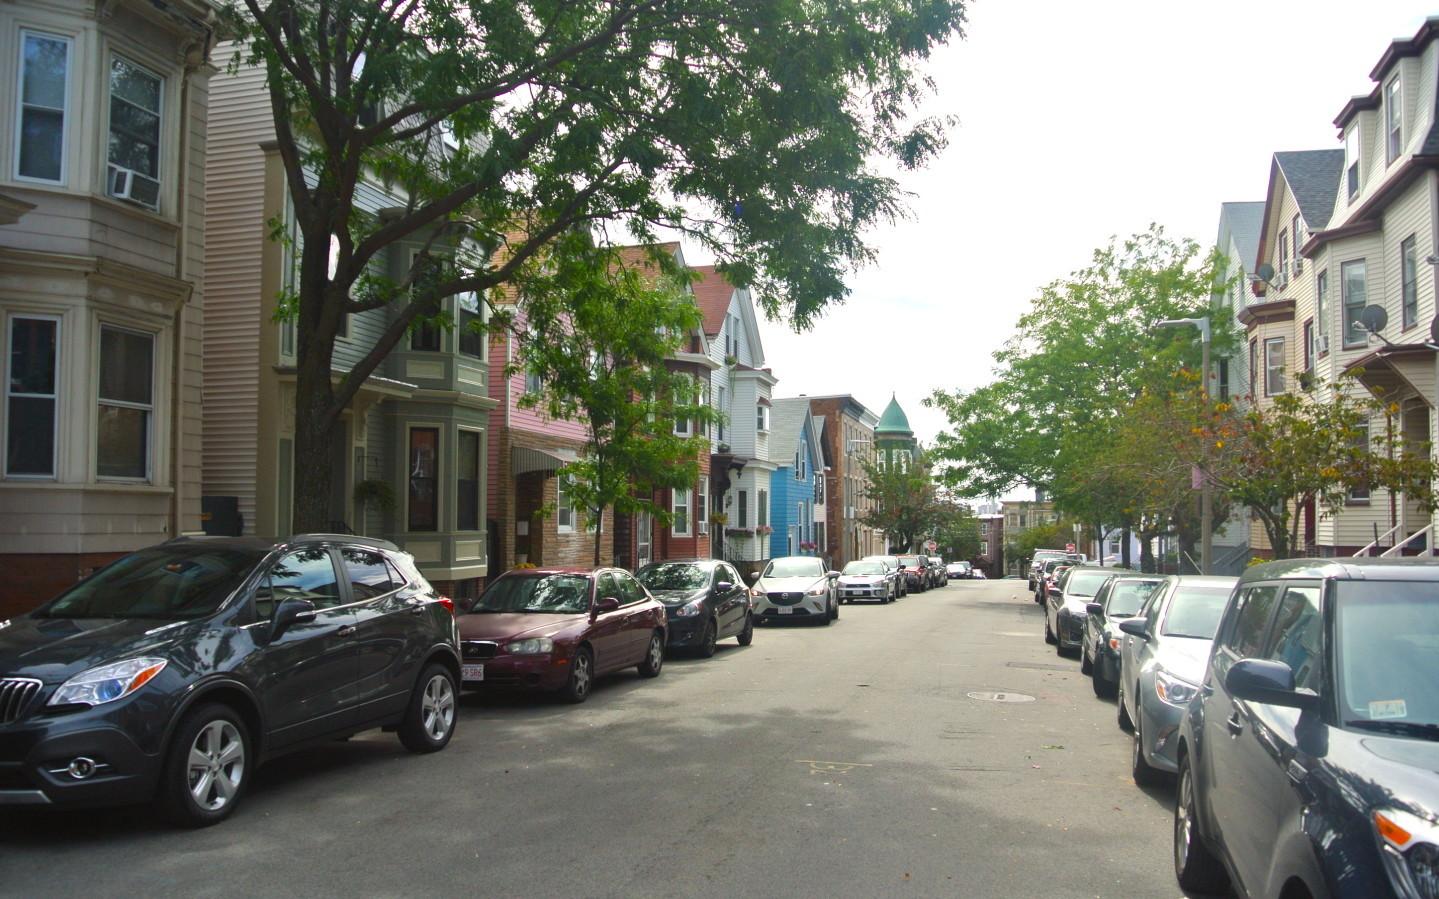 Monmouth_street_2016